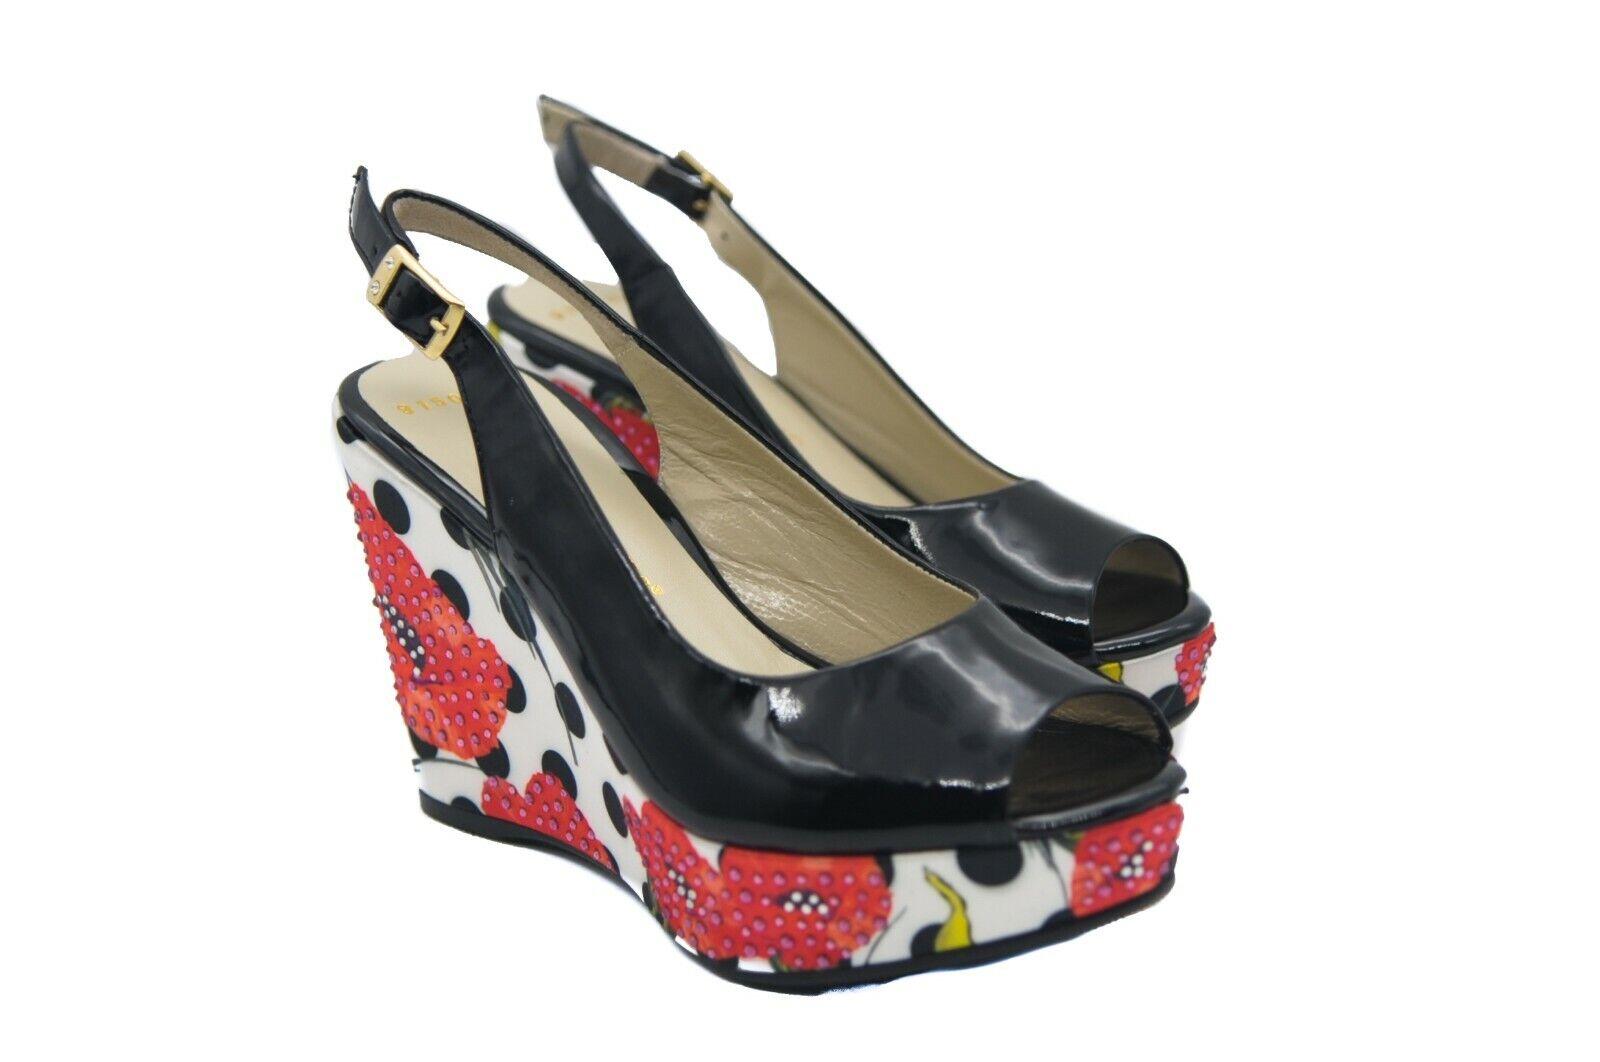 Goody2shoes Ladies Patent Black Slingback Peep Toe Wedges with Diamante Poppies